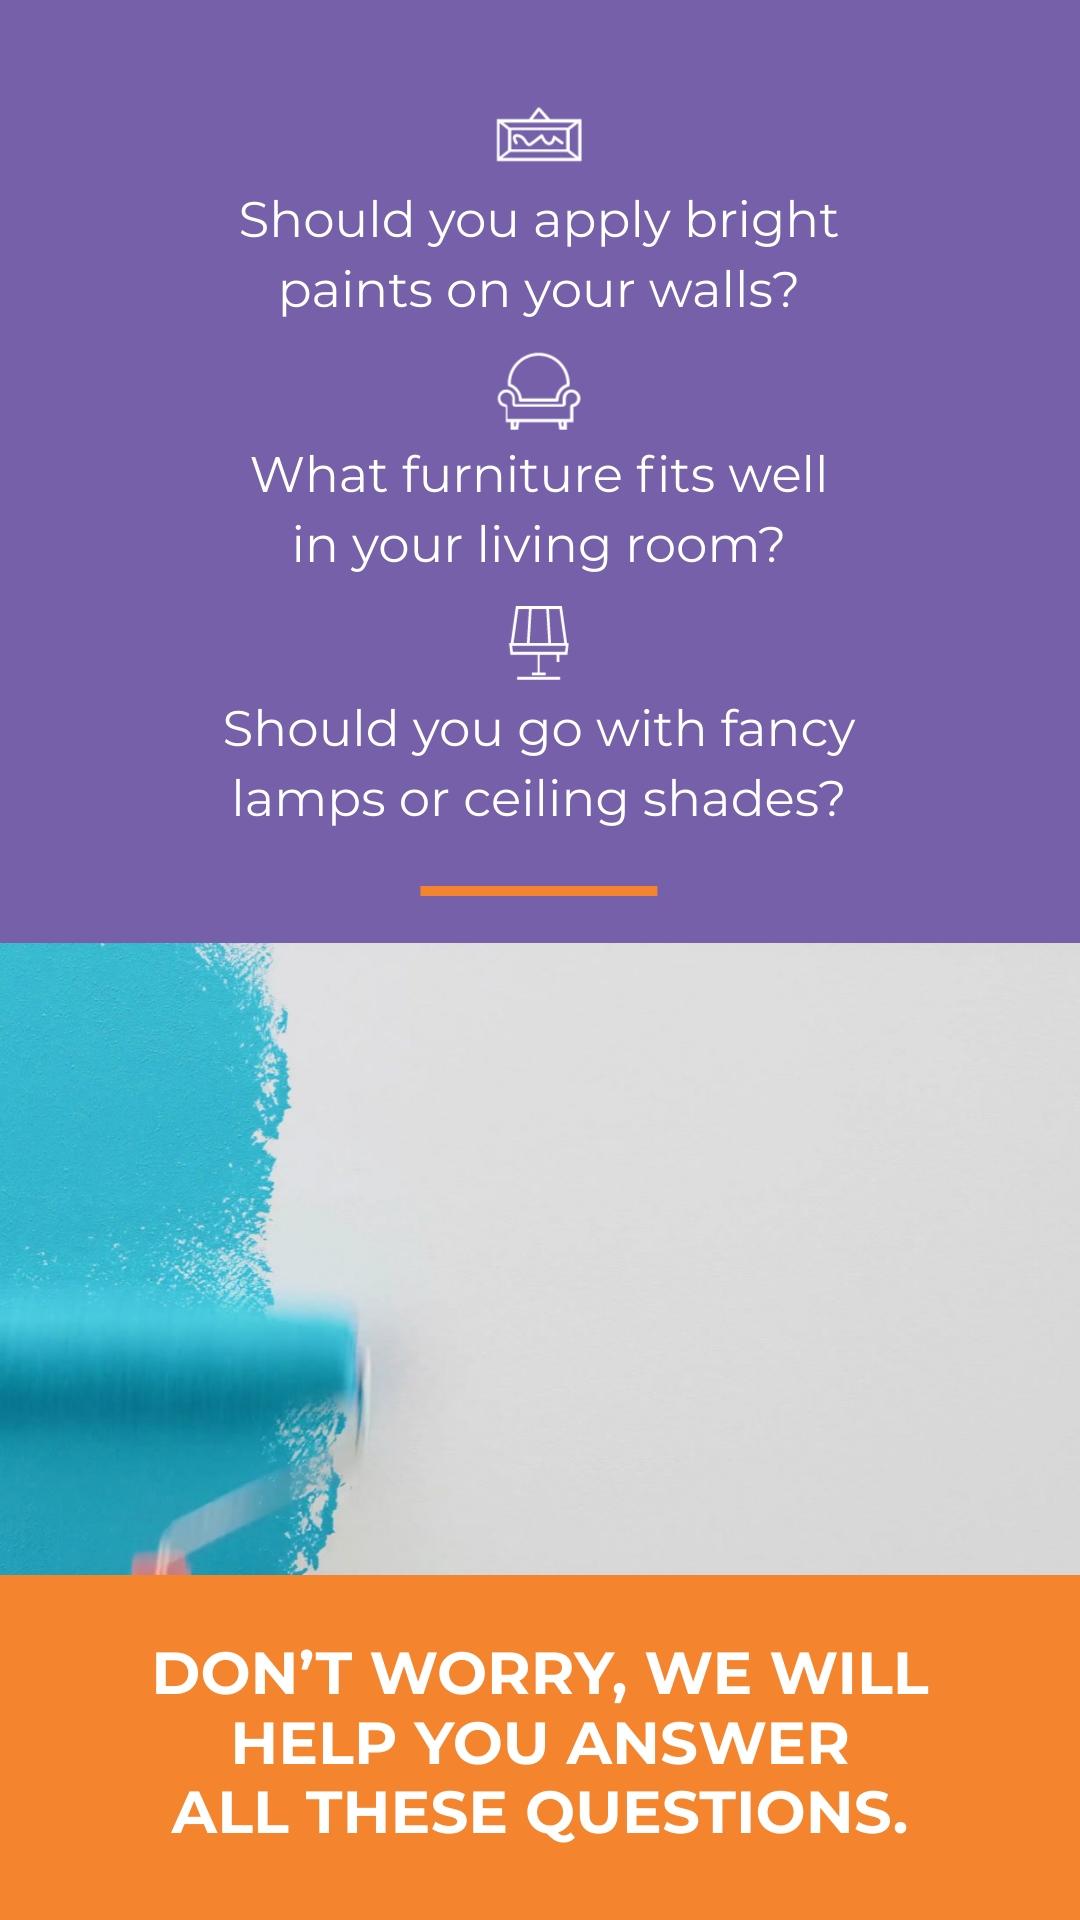 Interior Design Brand - Instagram Video Ad Template